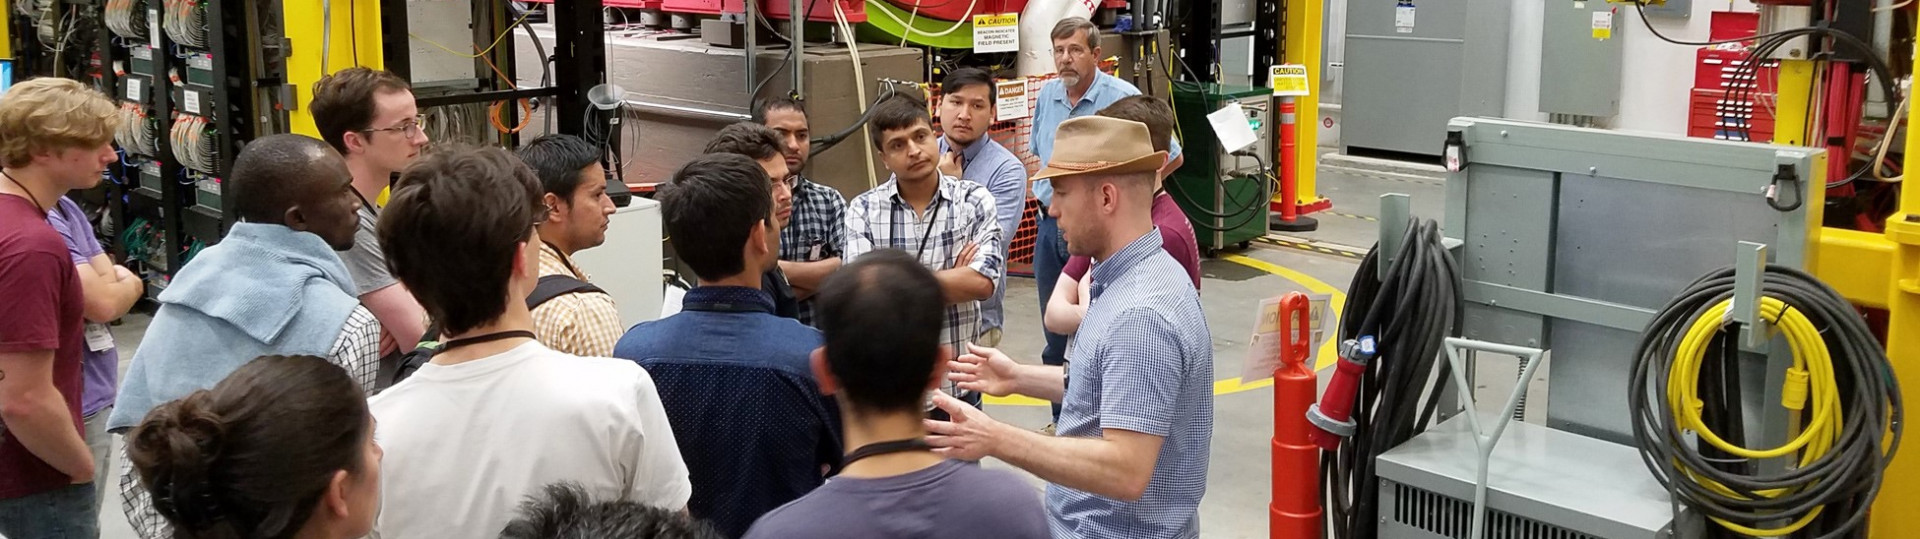 HUGS Students tour CEBAF's Experimental Hall D